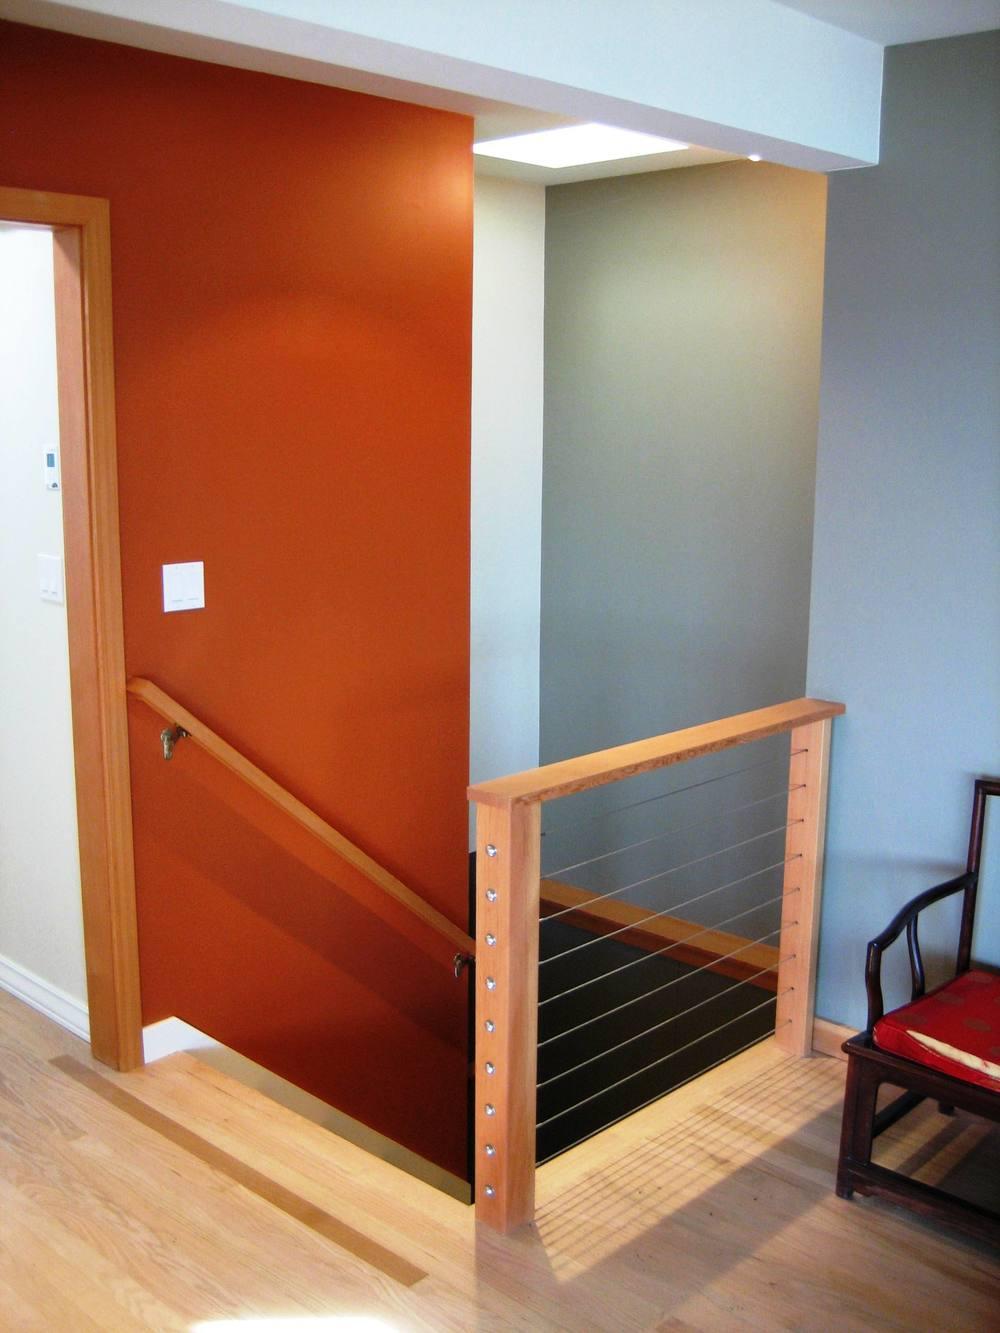 Luk_Stairs.JPG